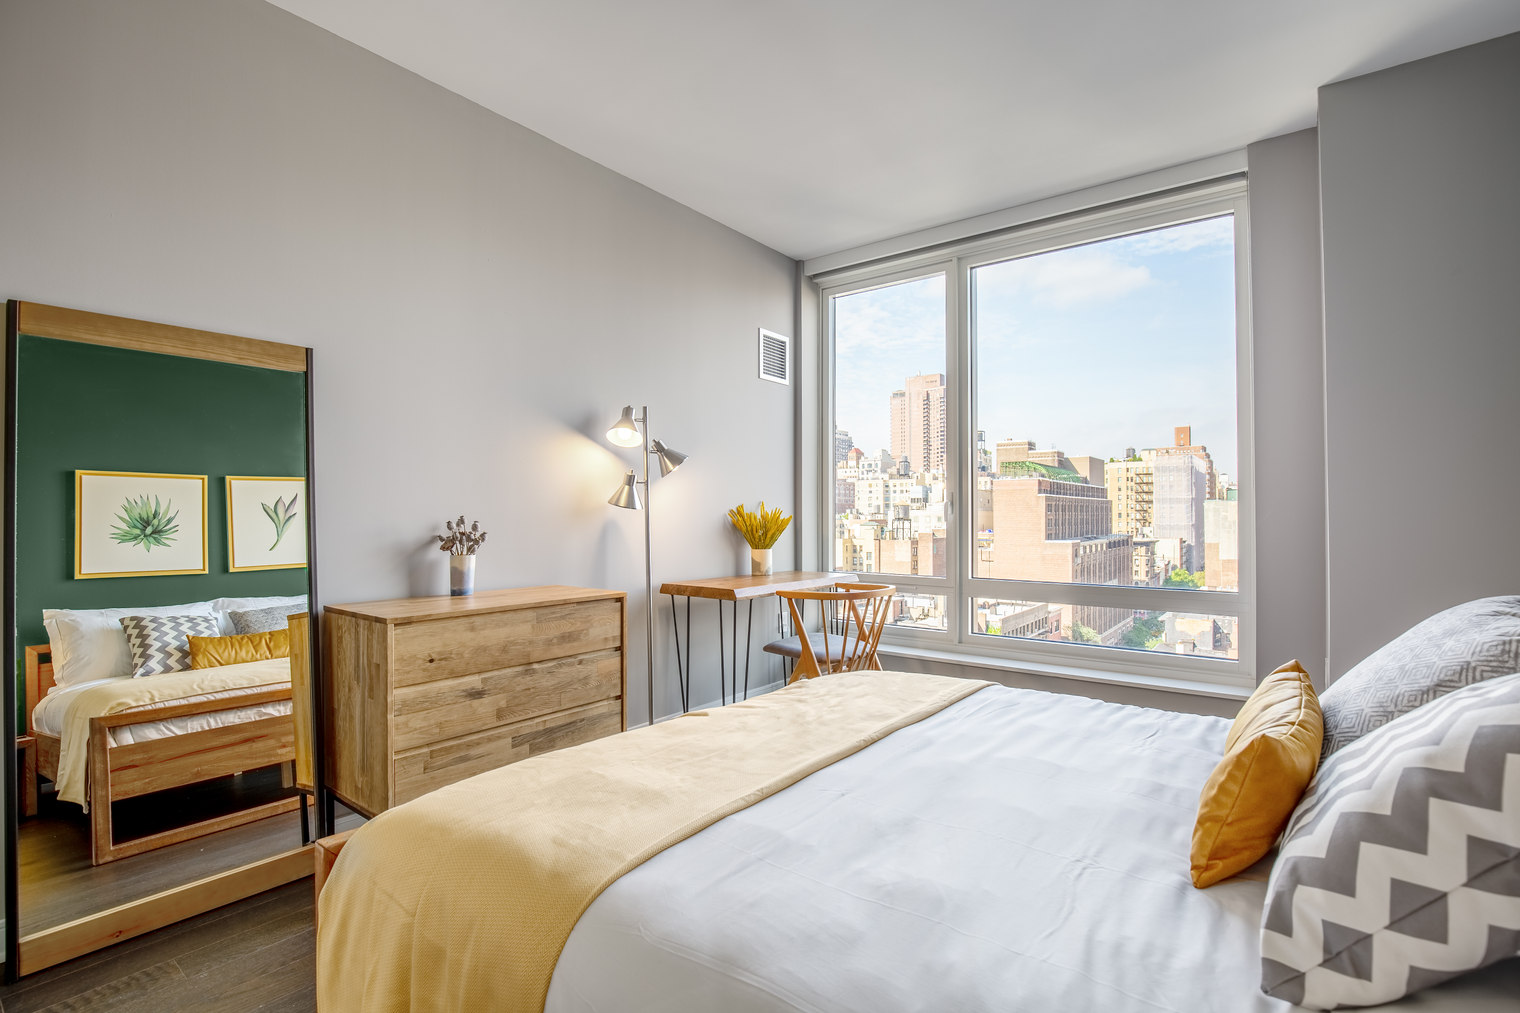 205 East 92nd Street Upper East Side New York NY 10128